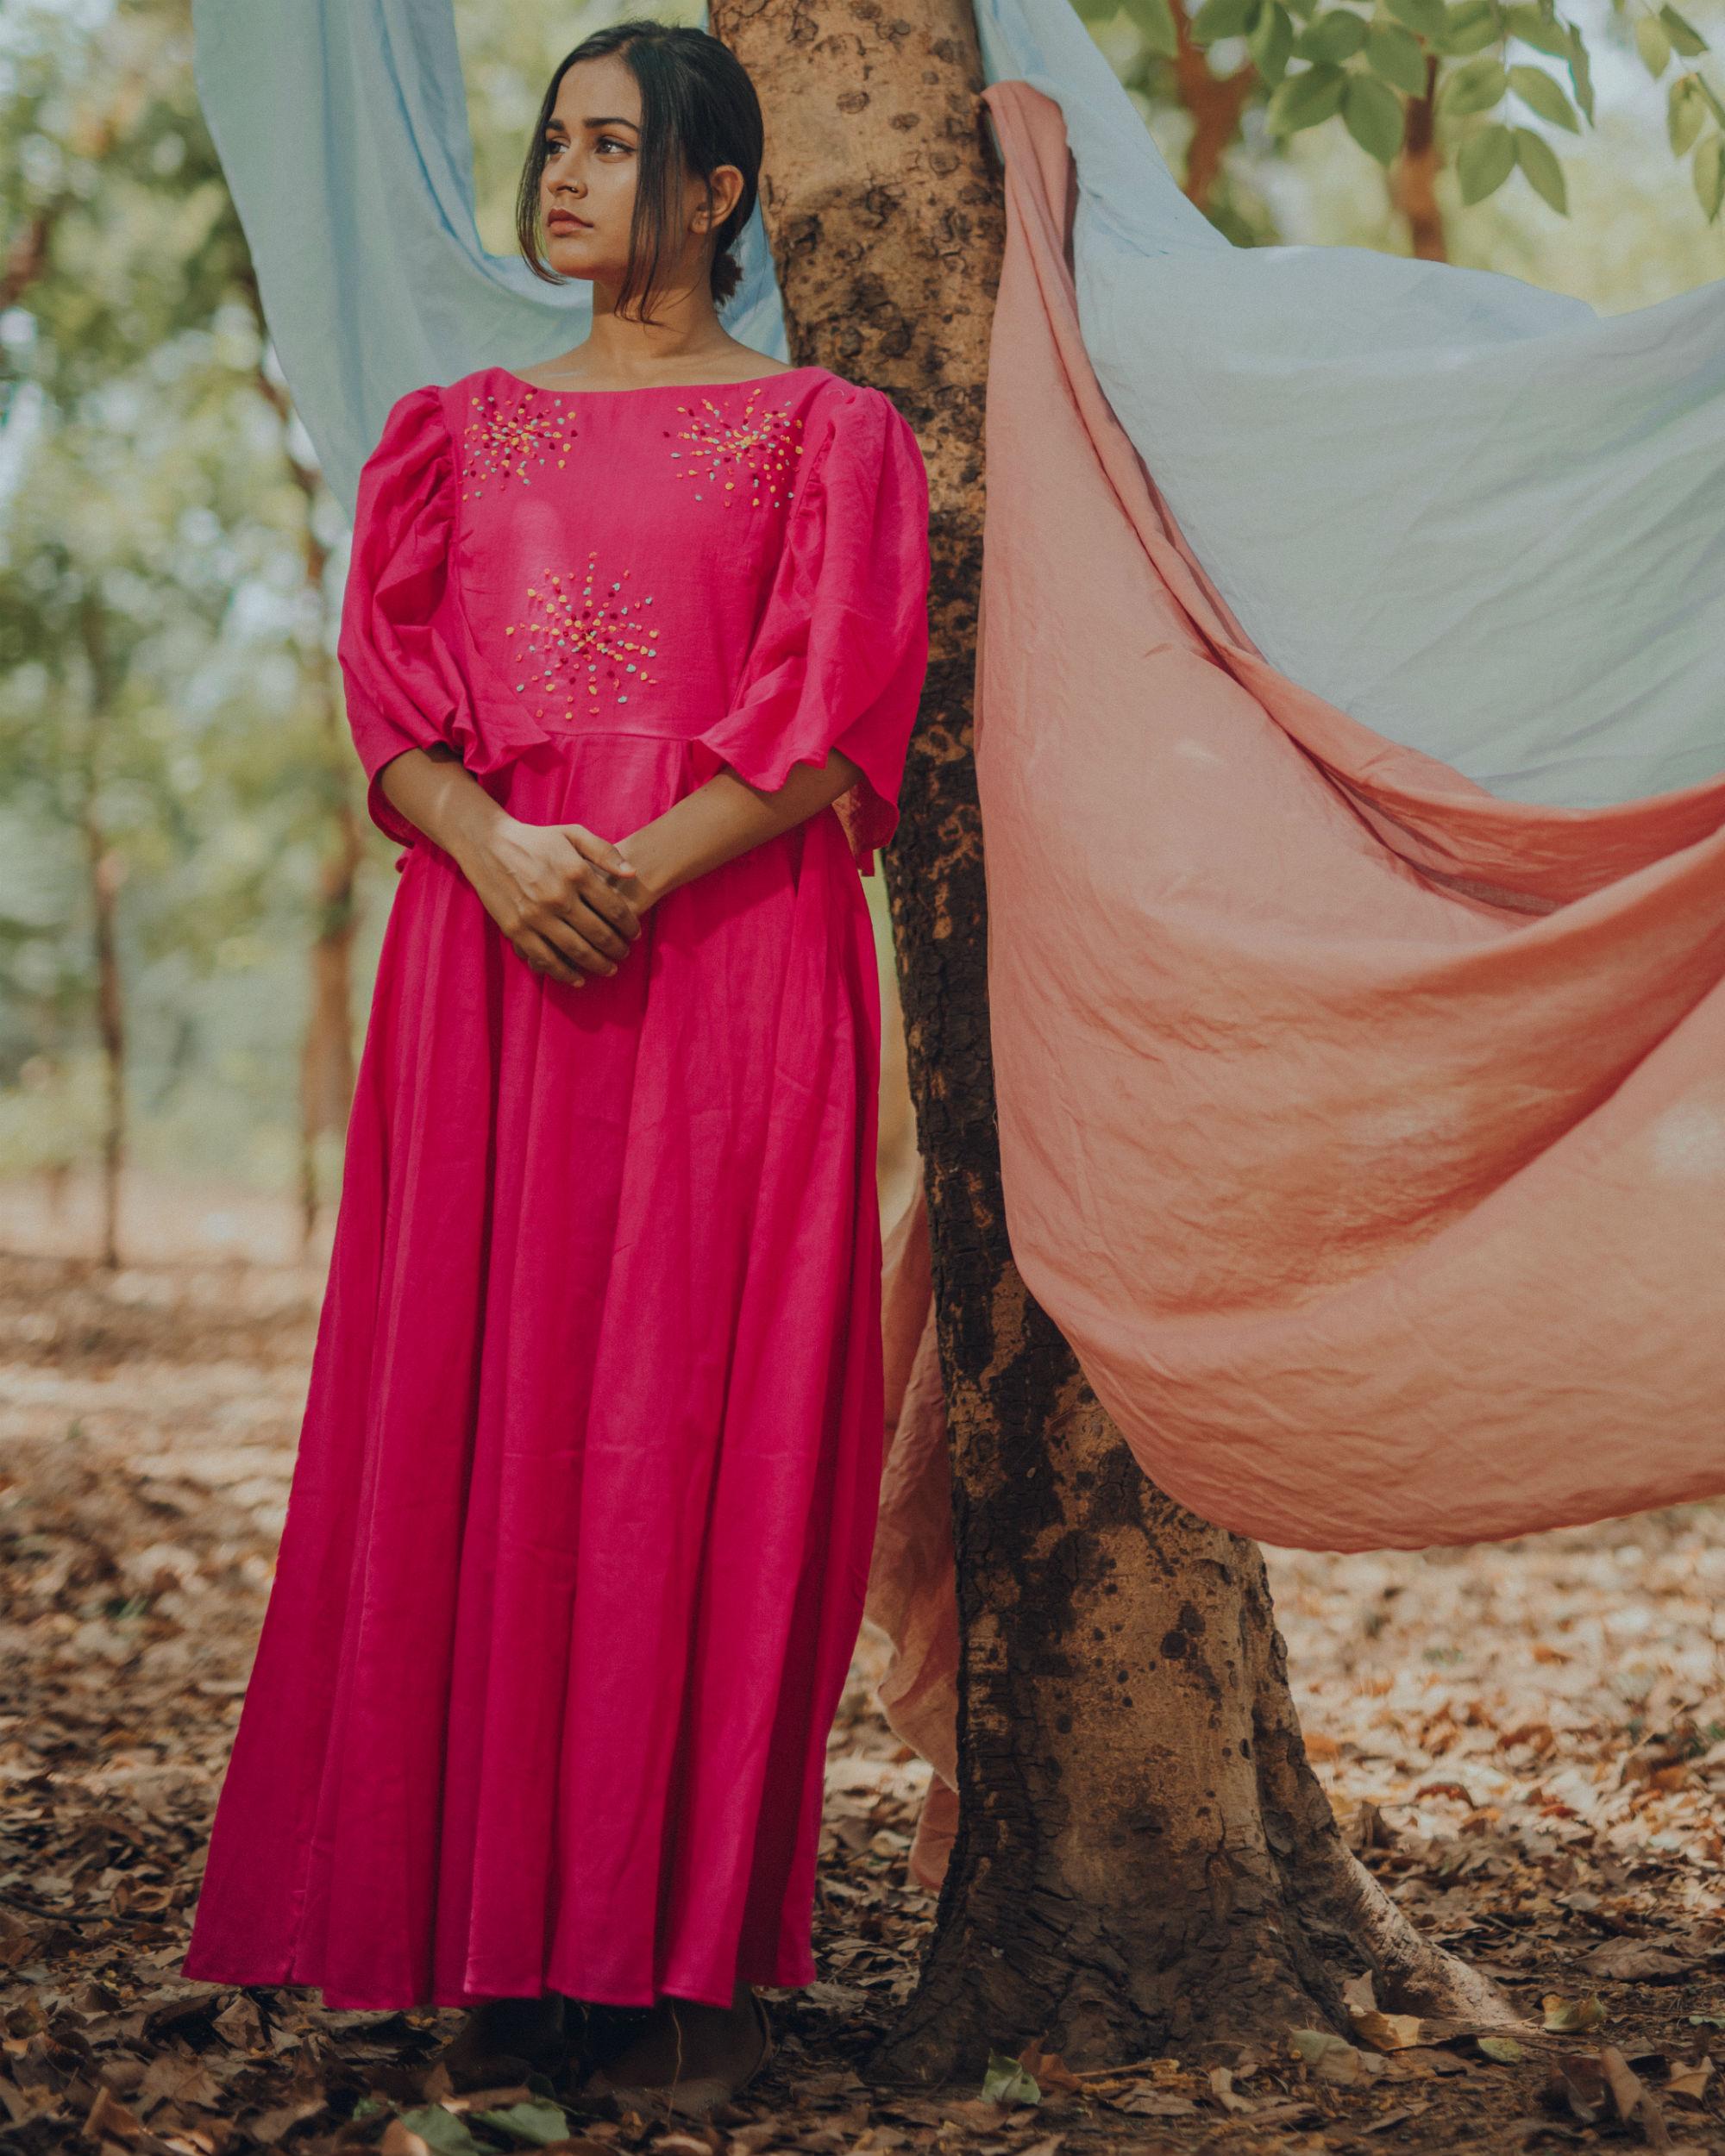 Vibrant pink frill dress